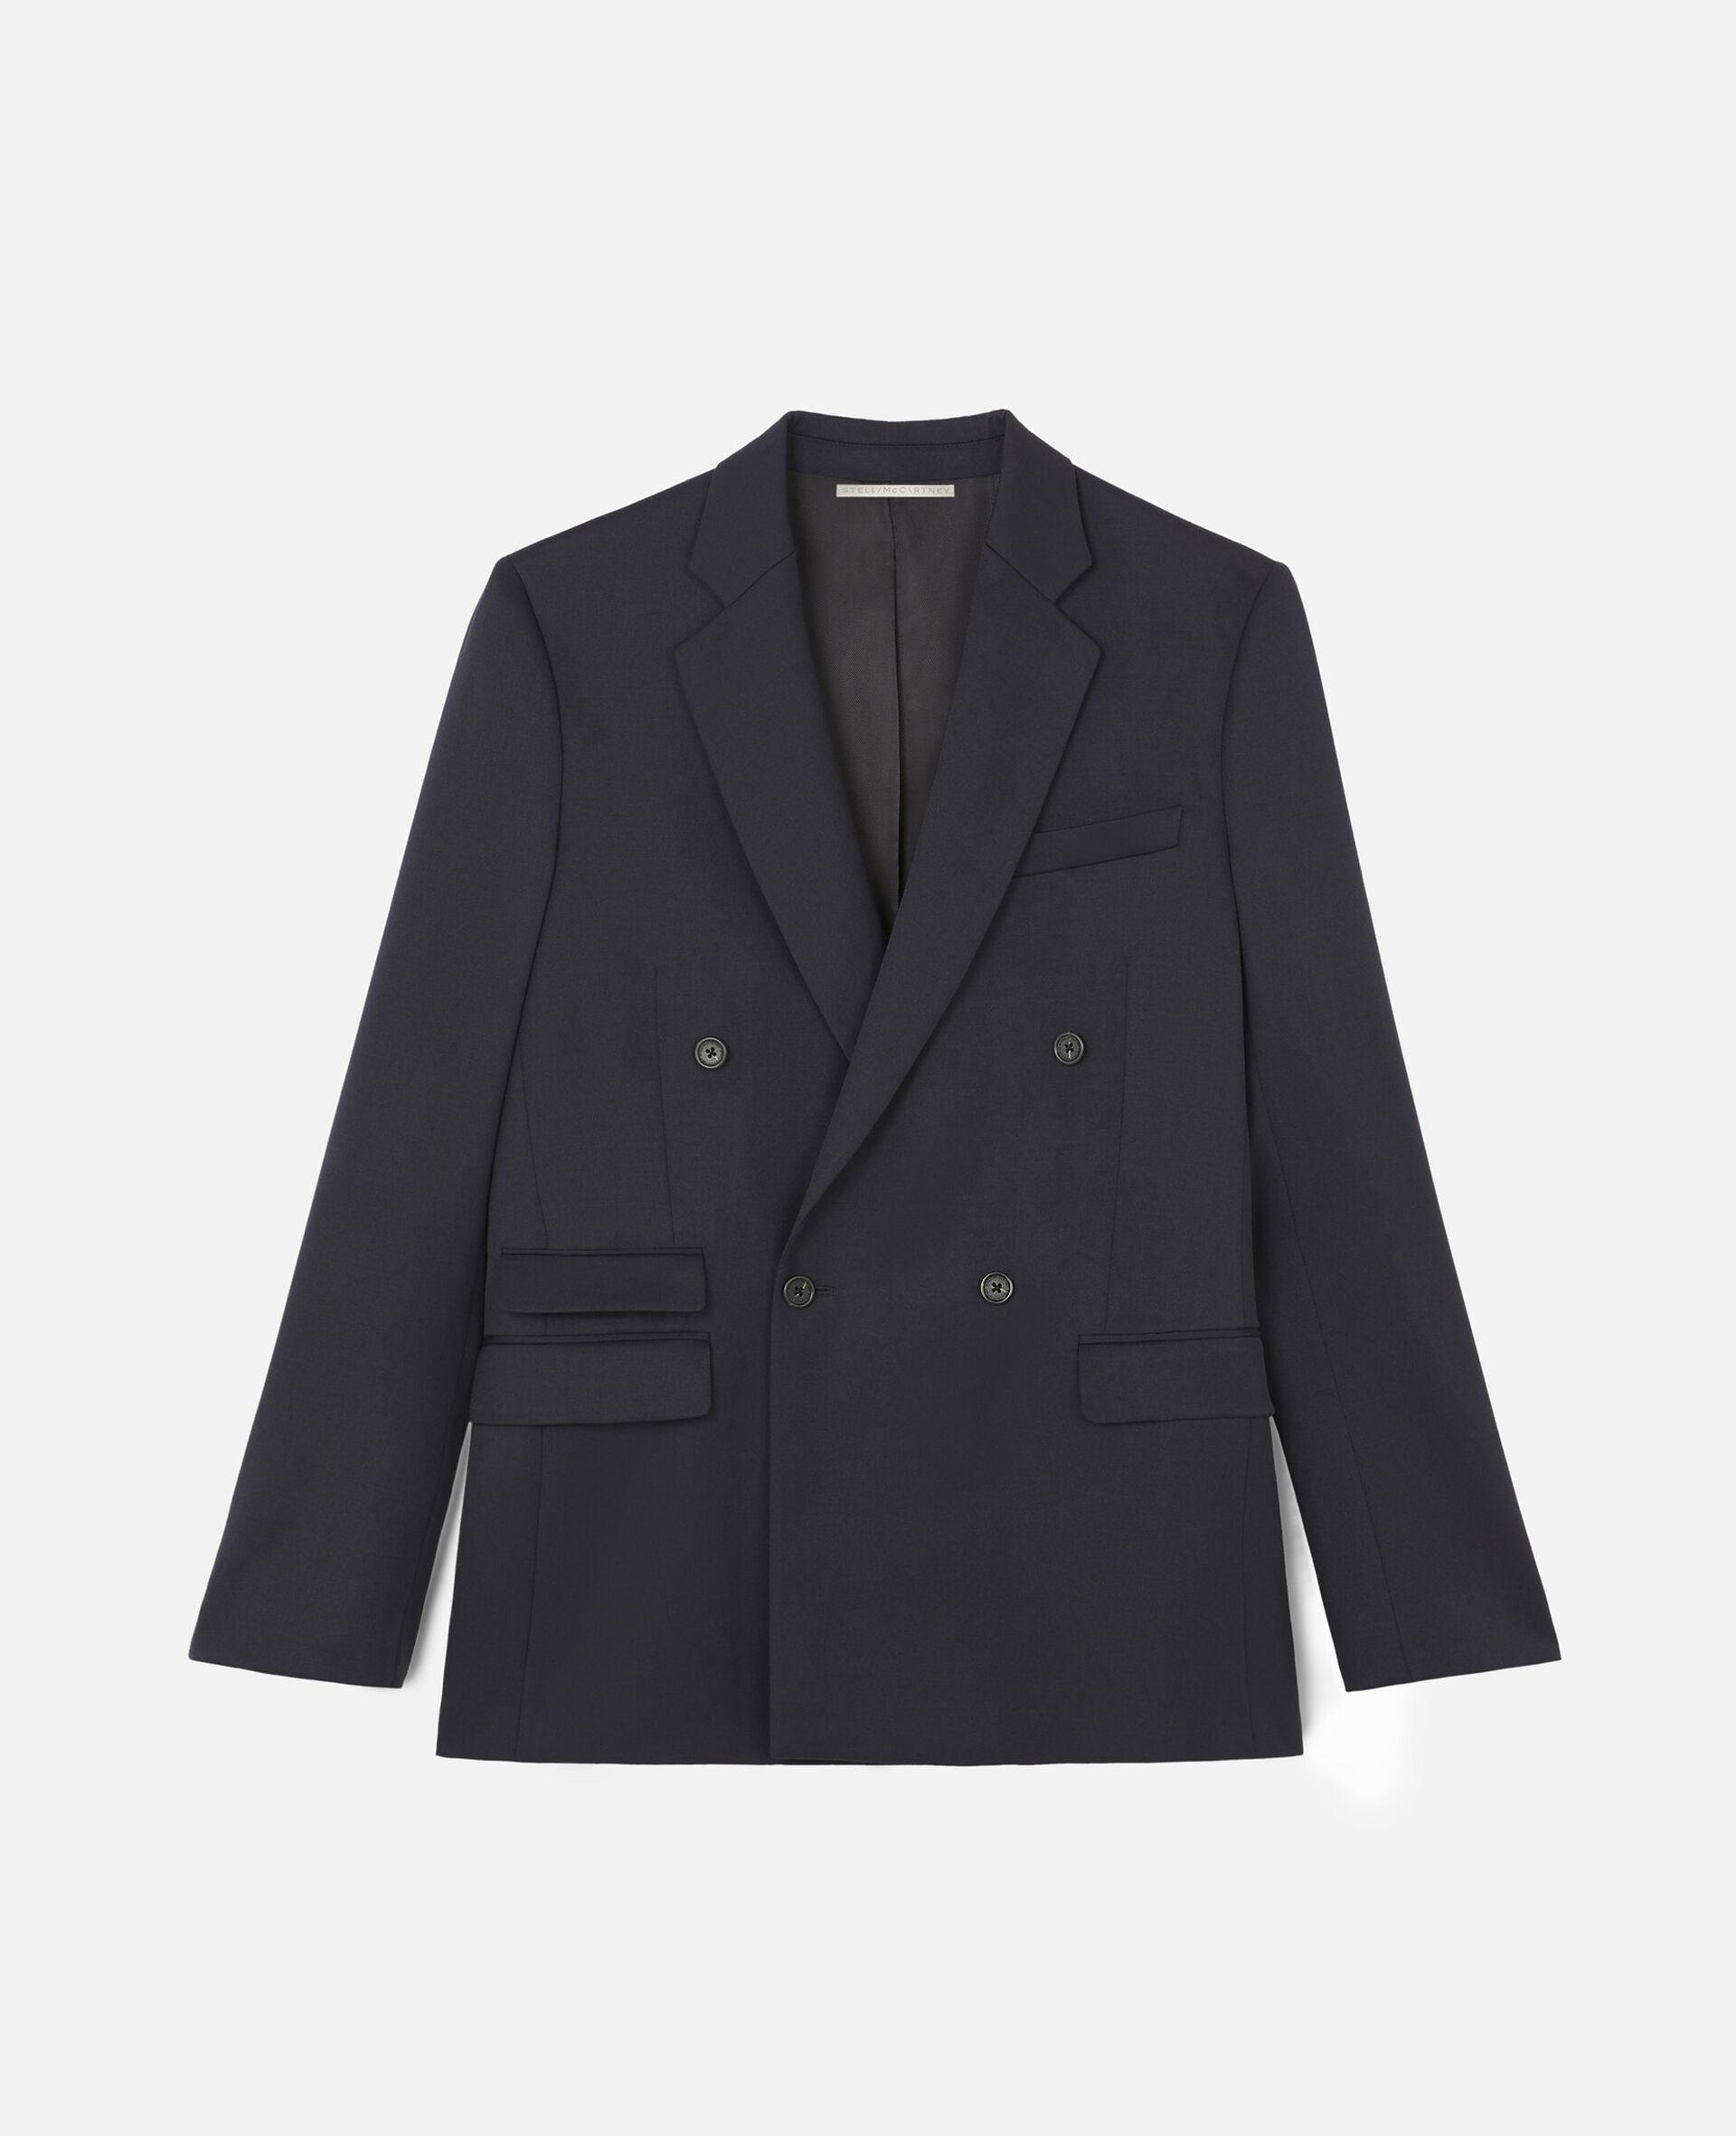 Couture-Jackett Holden-Blau-large image number 0